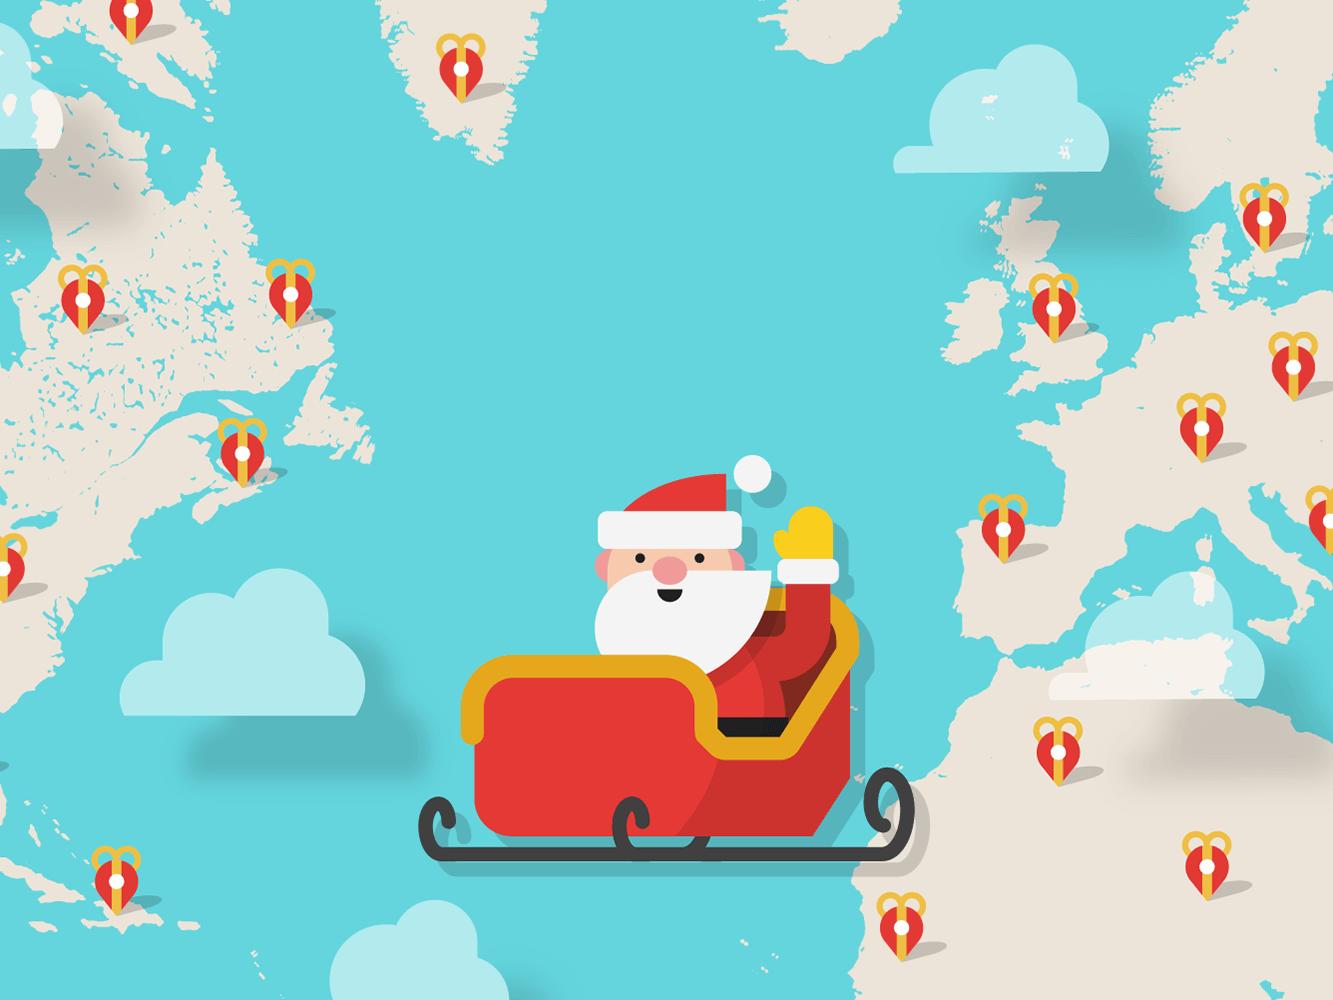 Track Santa Google Santa Tracker Thanks for dropping